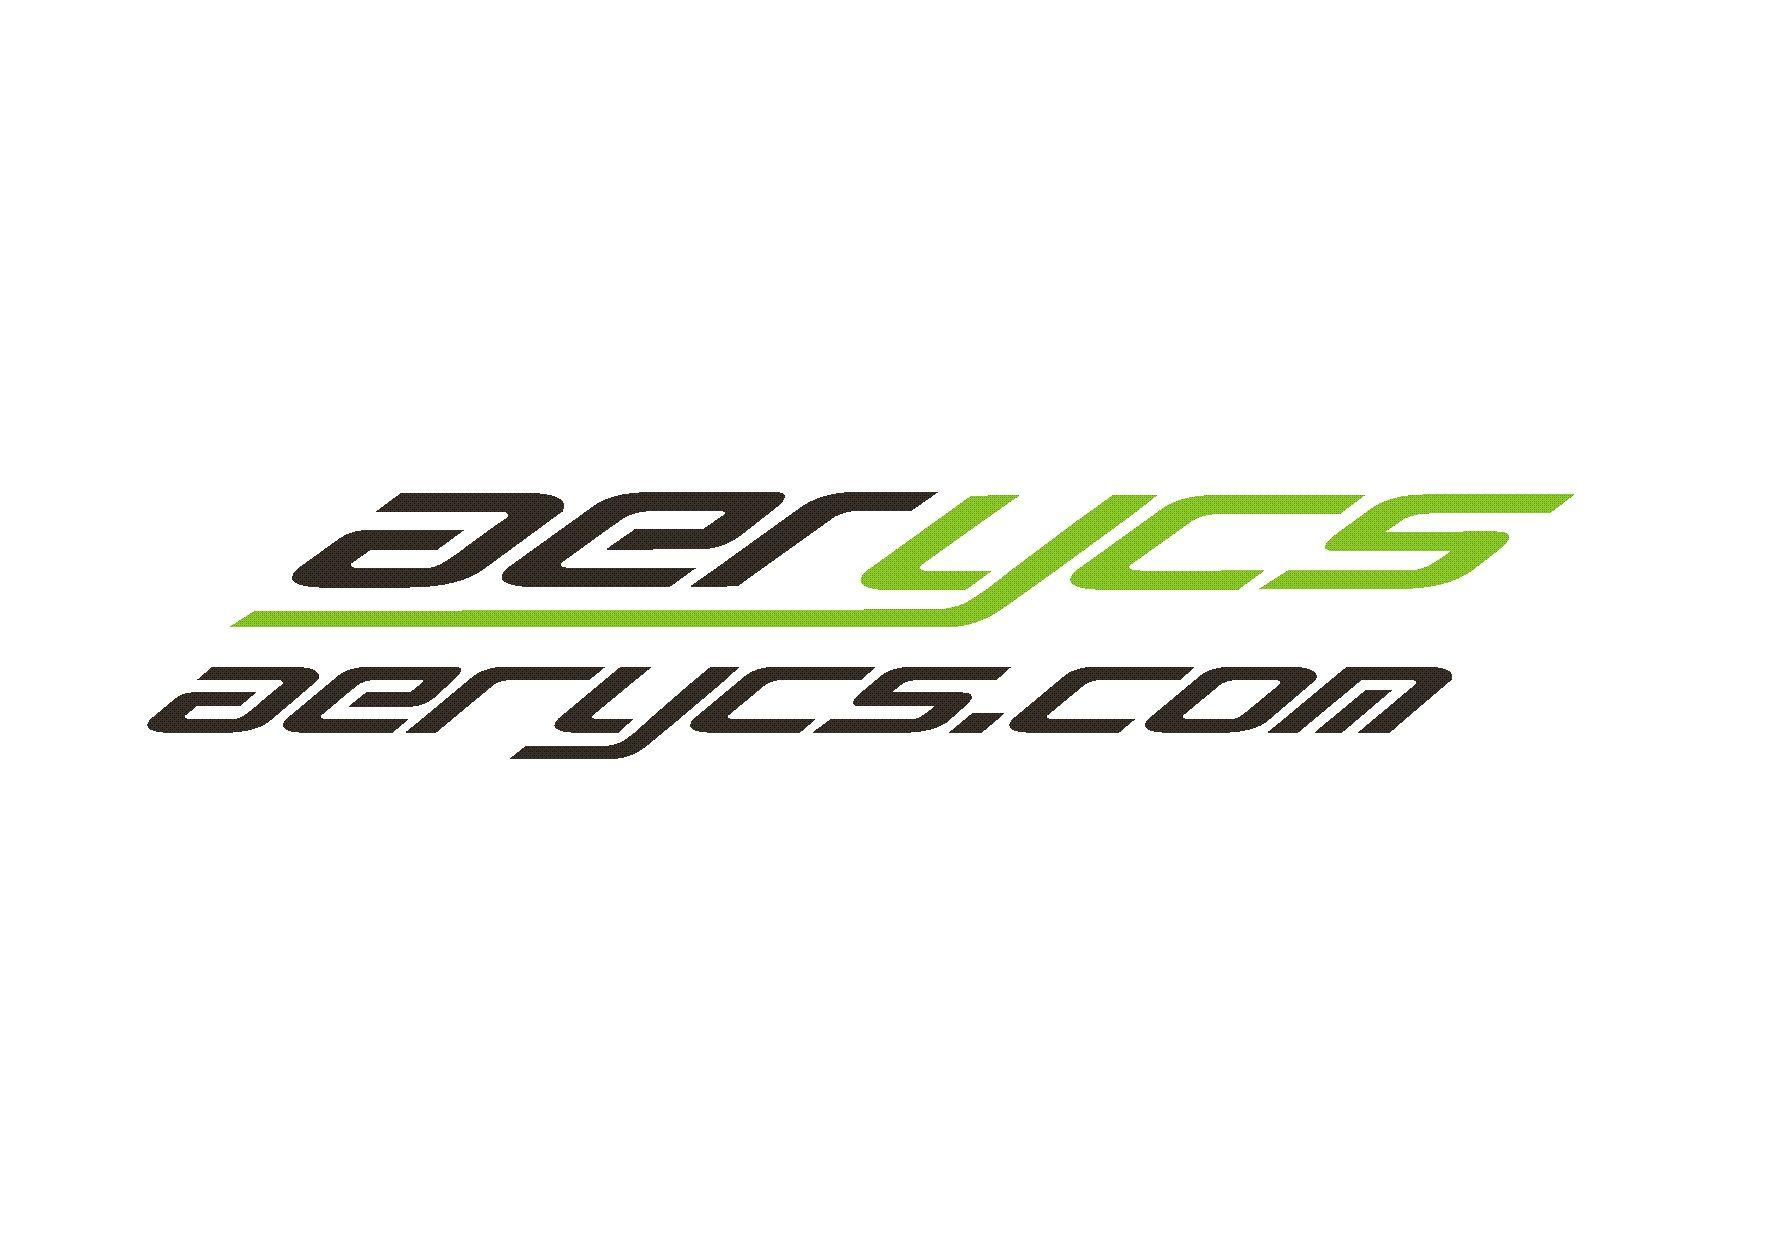 aerycs logo